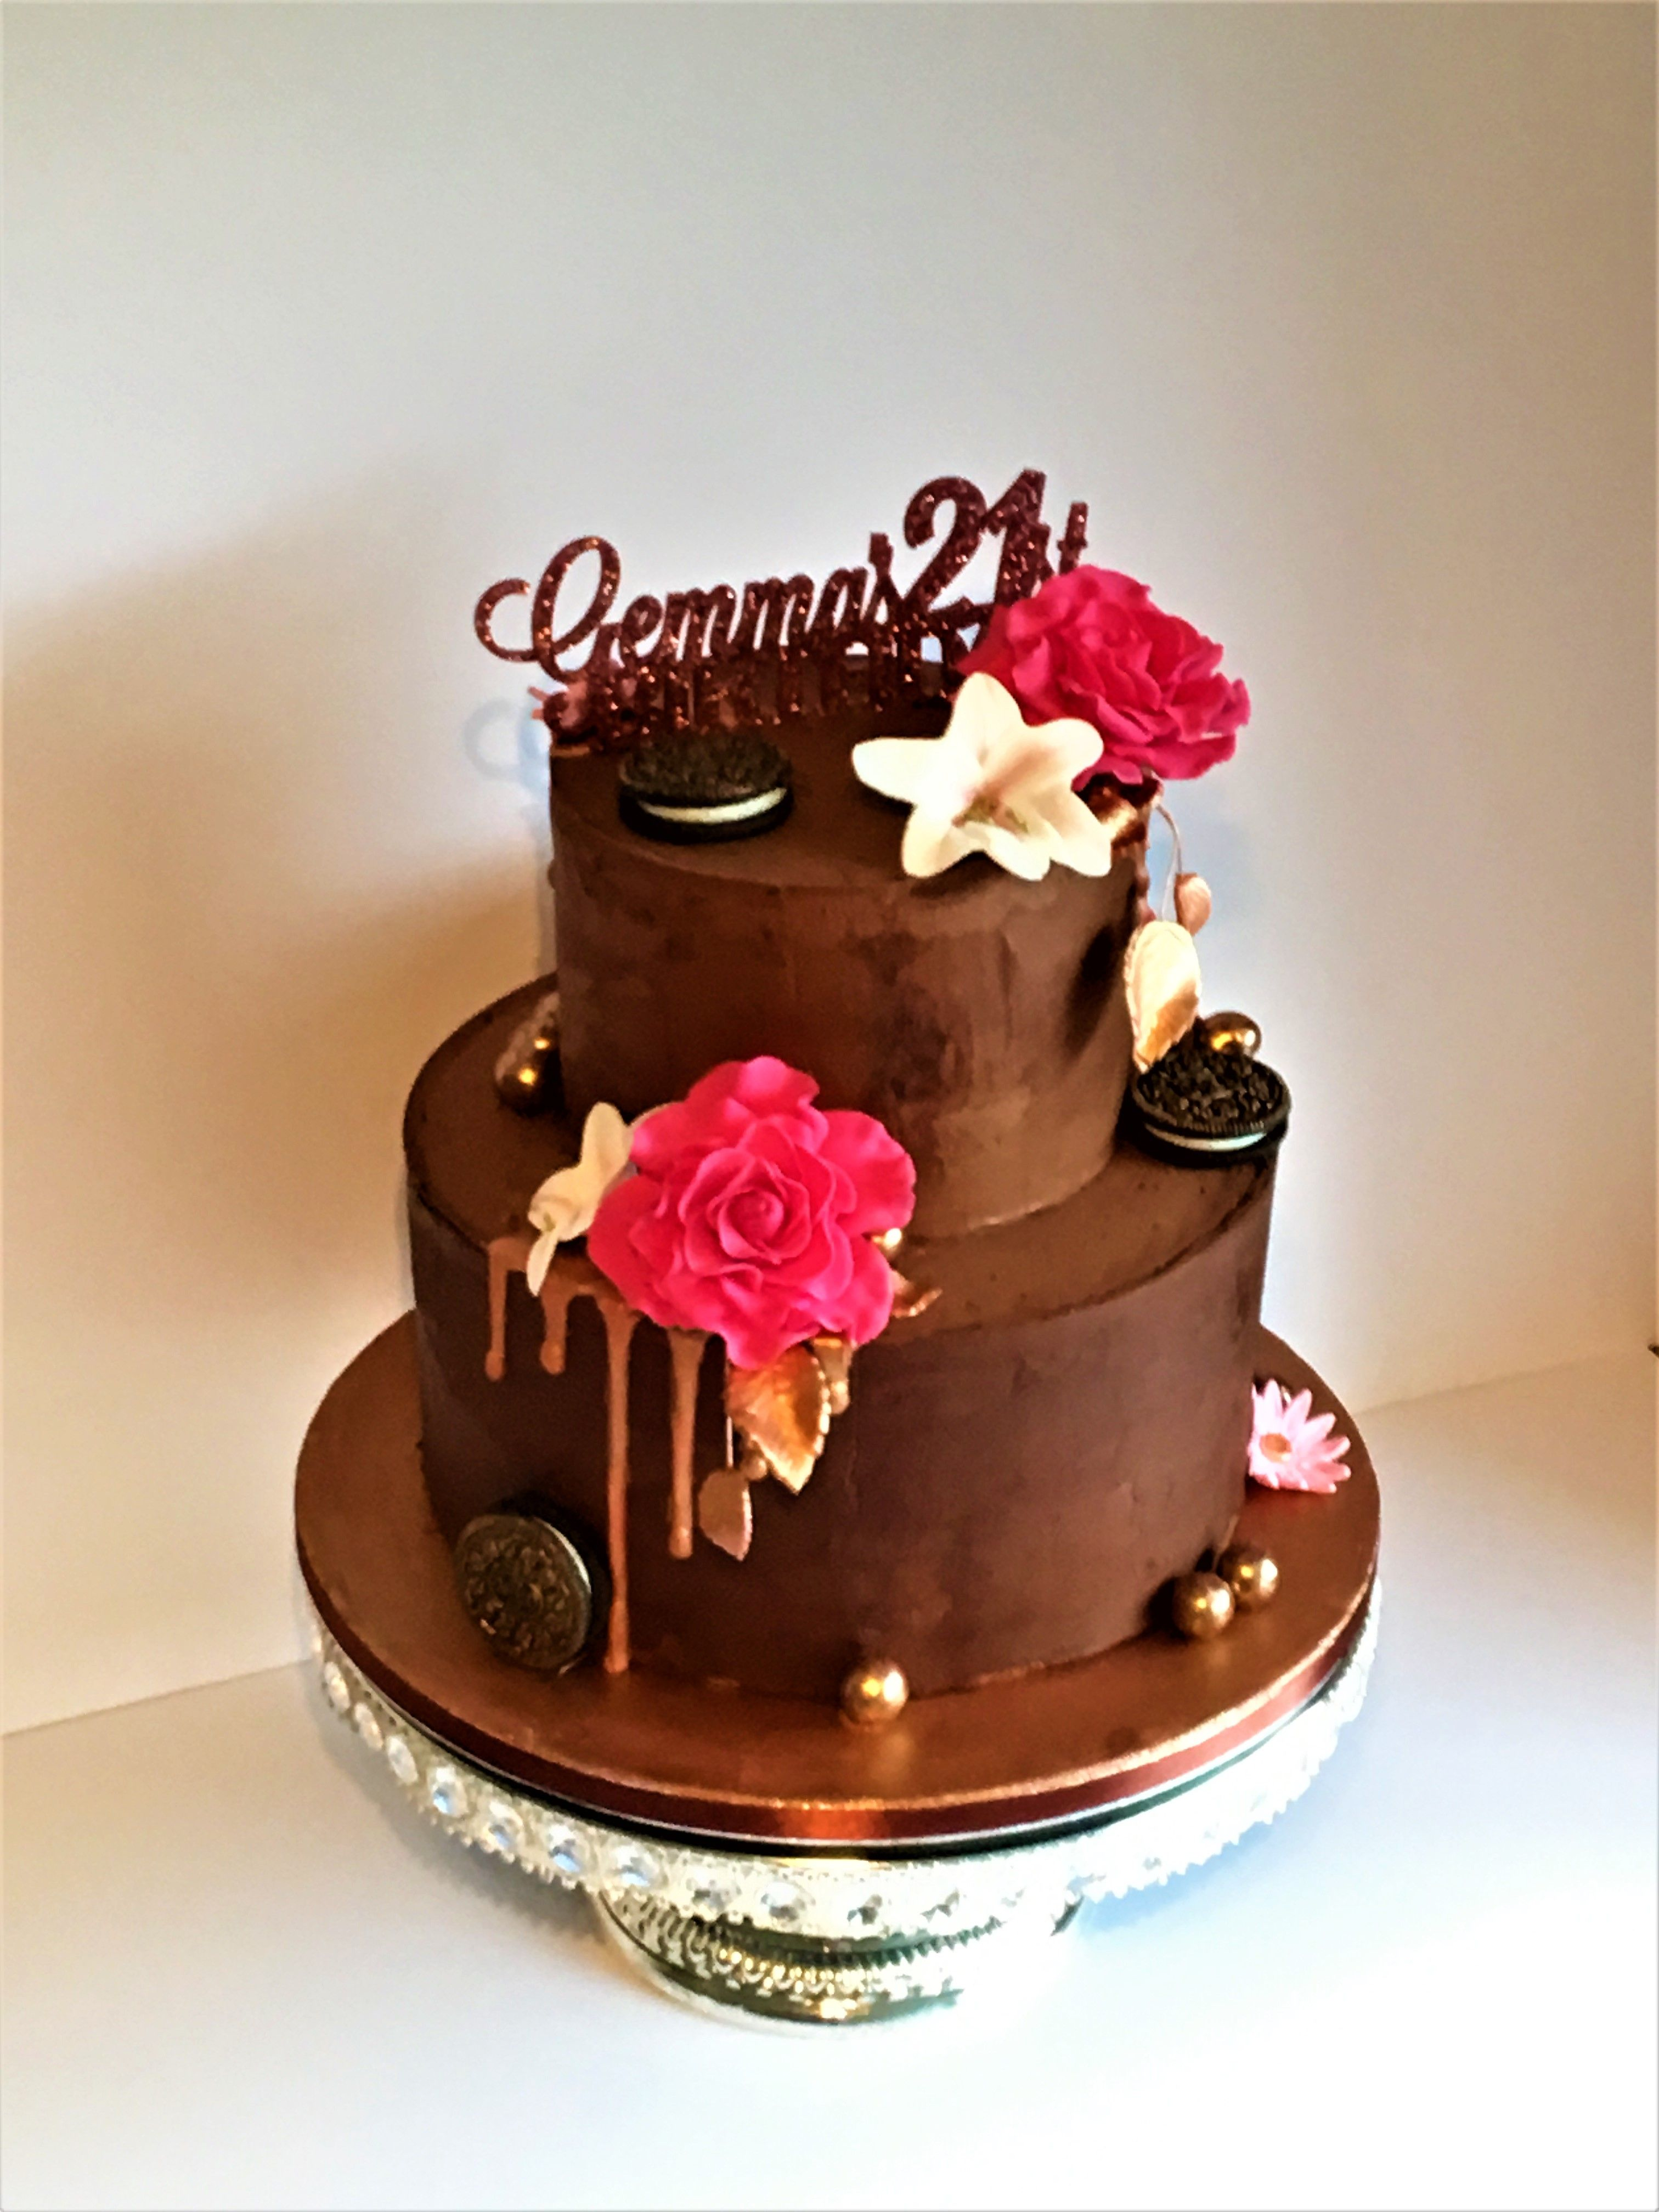 21st Birthday Cake Chocolate Drizzle